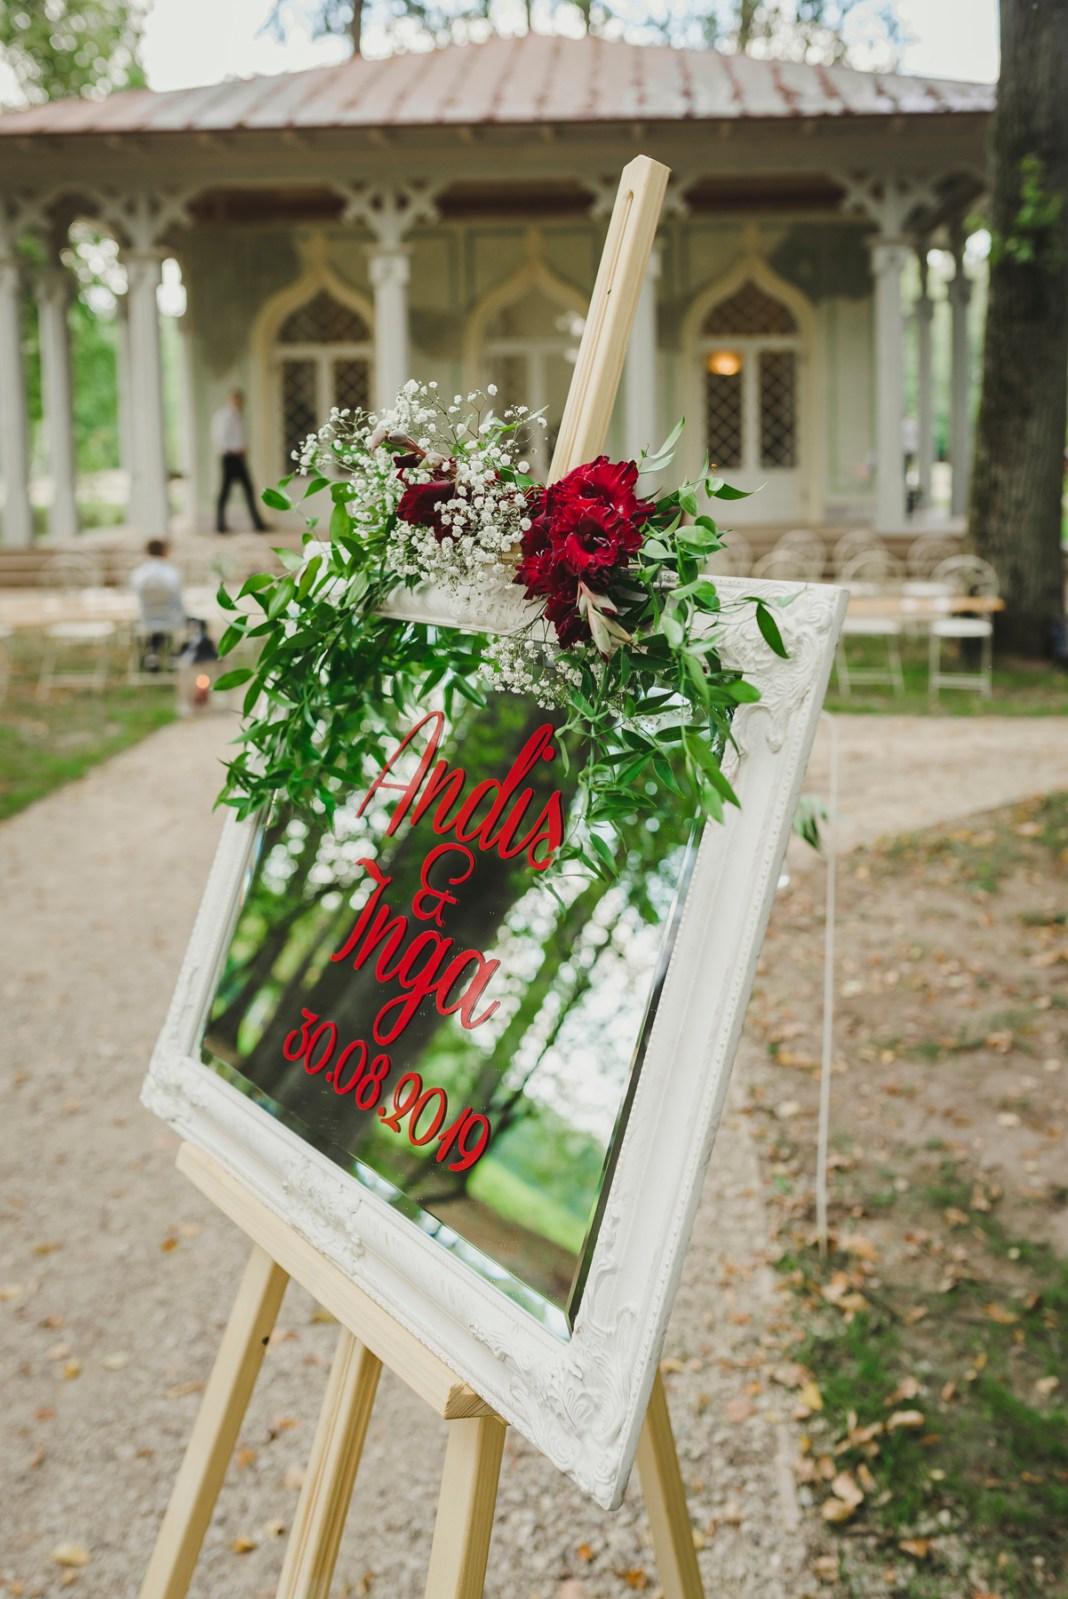 Elejas tea house wedding photoshoot